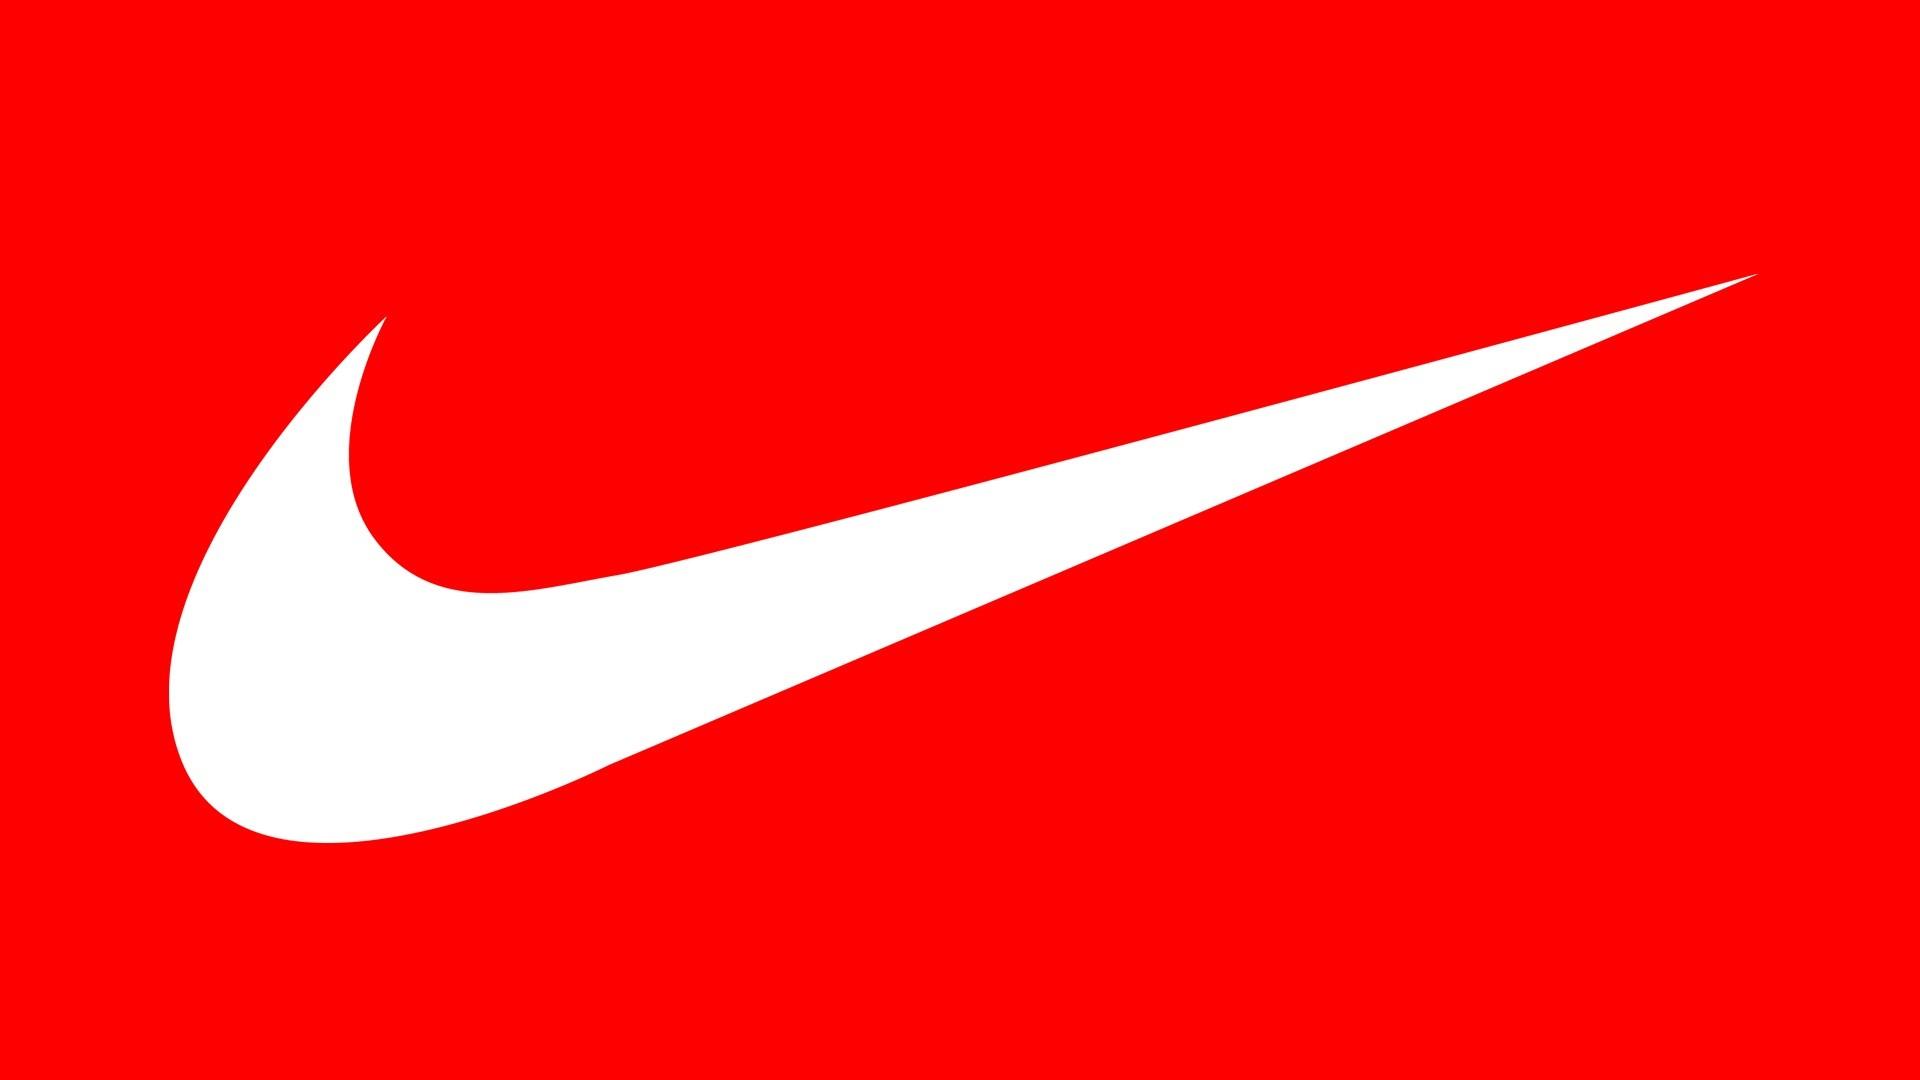 25 Impressive Nike Wallpapers For Desktop